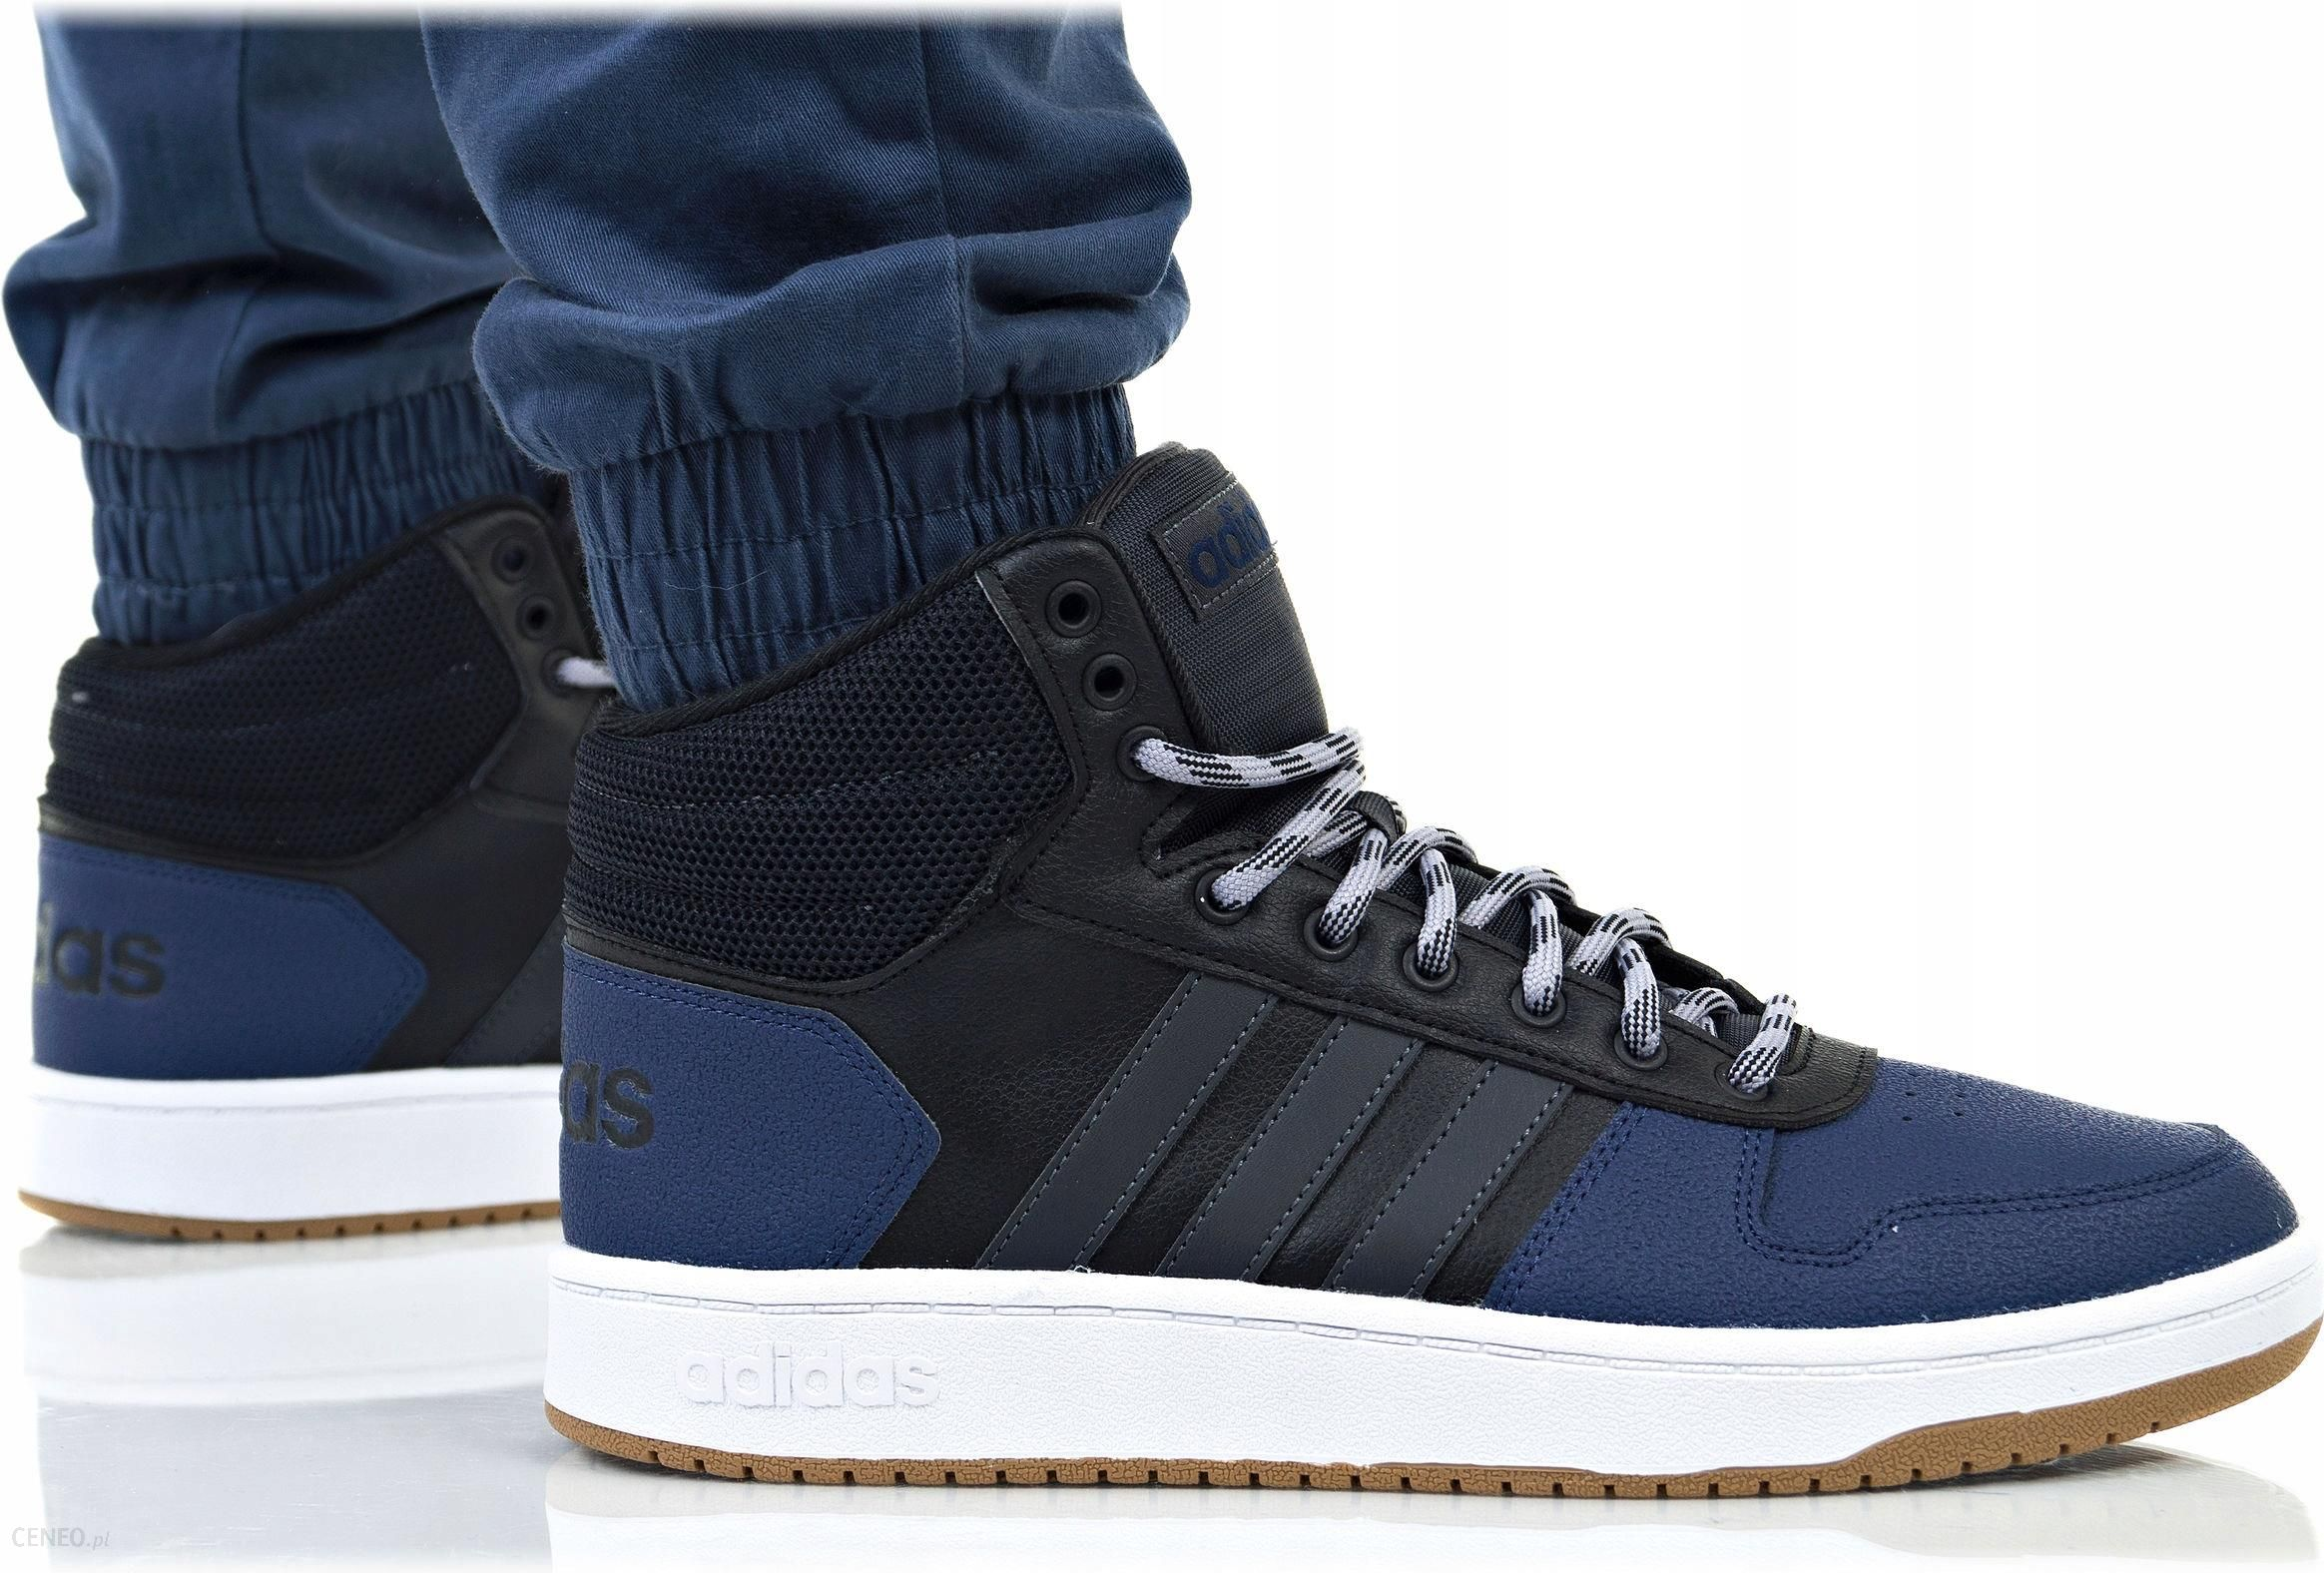 Buty męskie ADIDAS HOOPS 2.0 MID B44613 r.45 13   Adidas